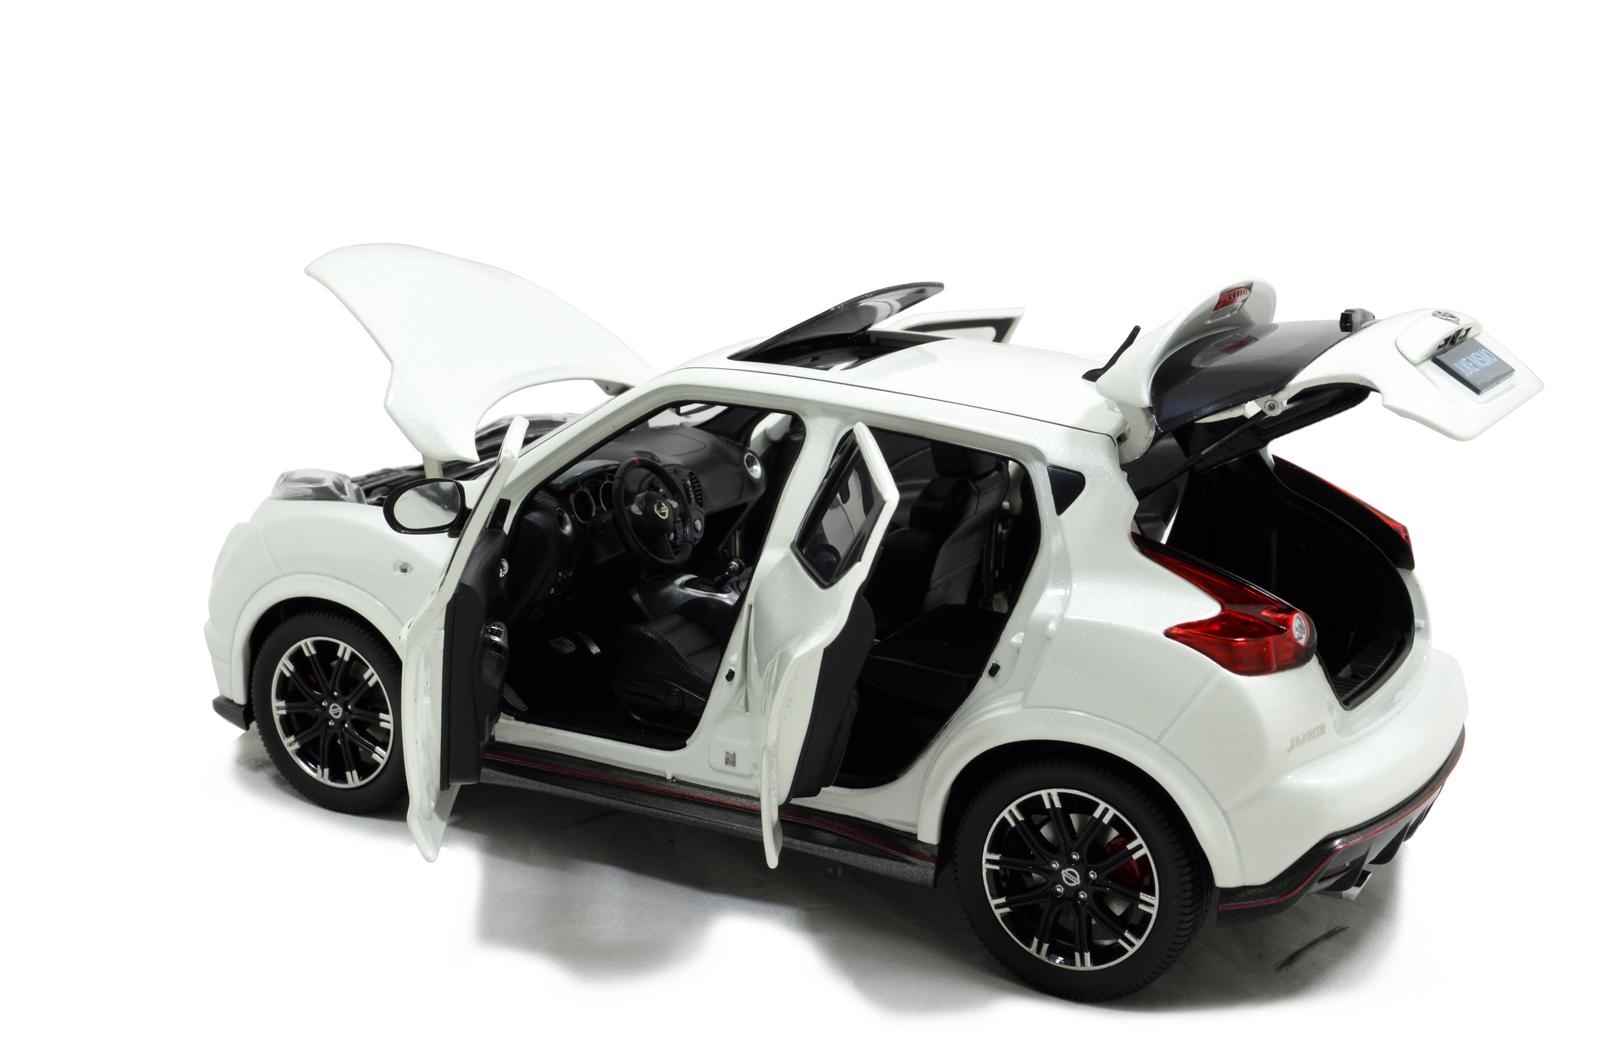 Nissan Juke Nismo RS 2014 1/18 Scale Diecast Model Car Wholesale 16